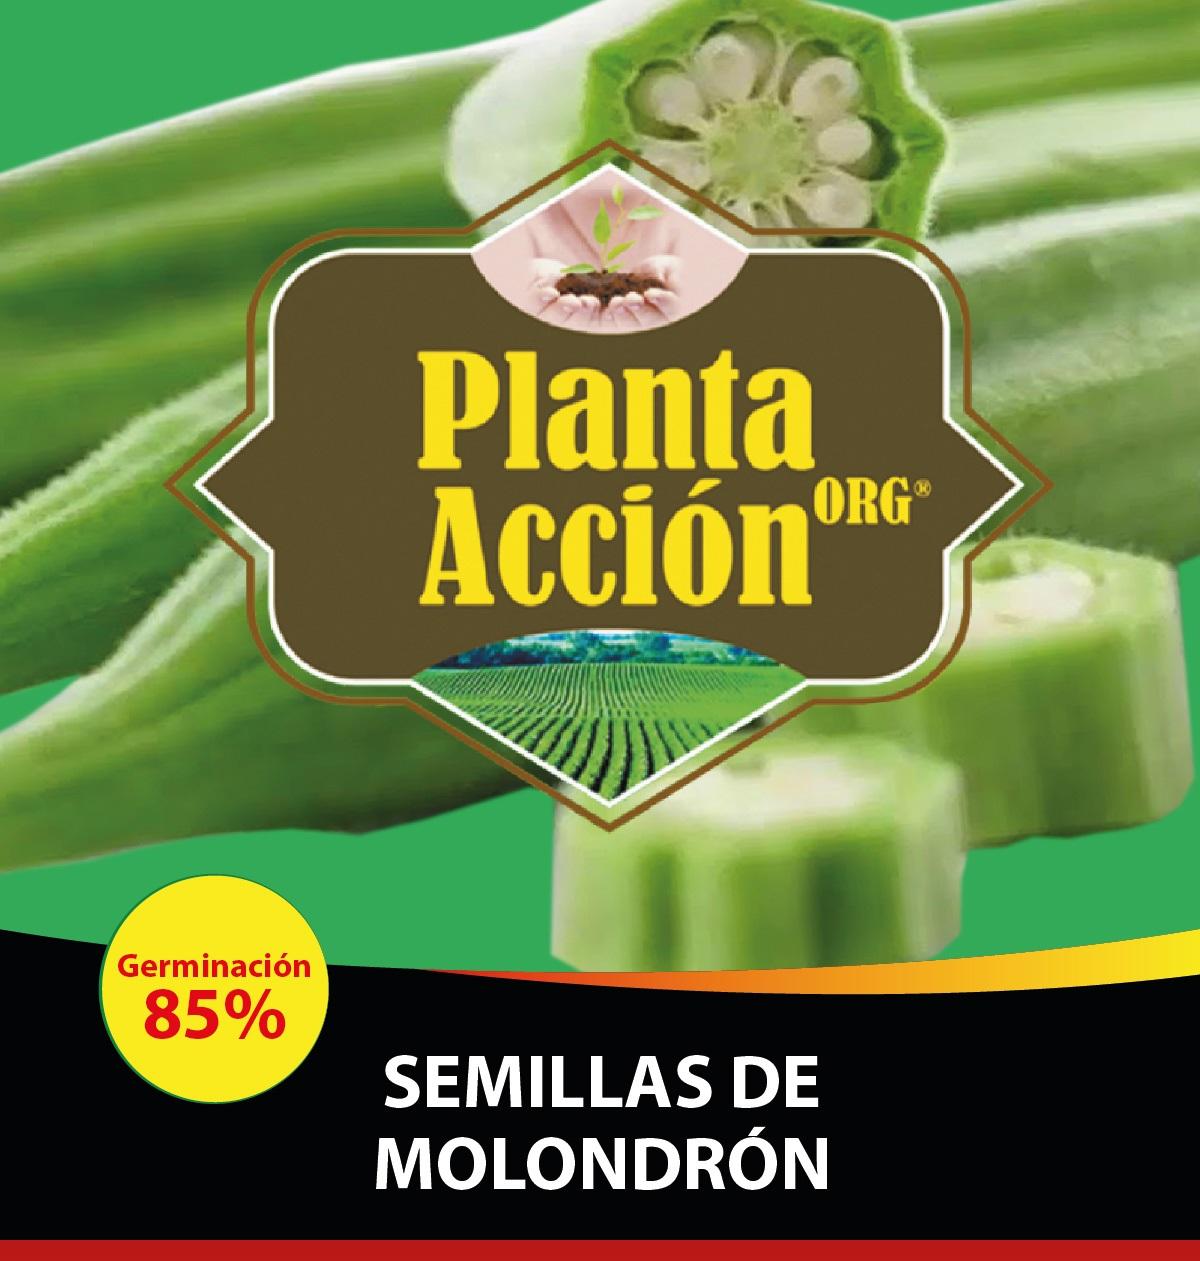 SEMILLAS DE MOLONDRON